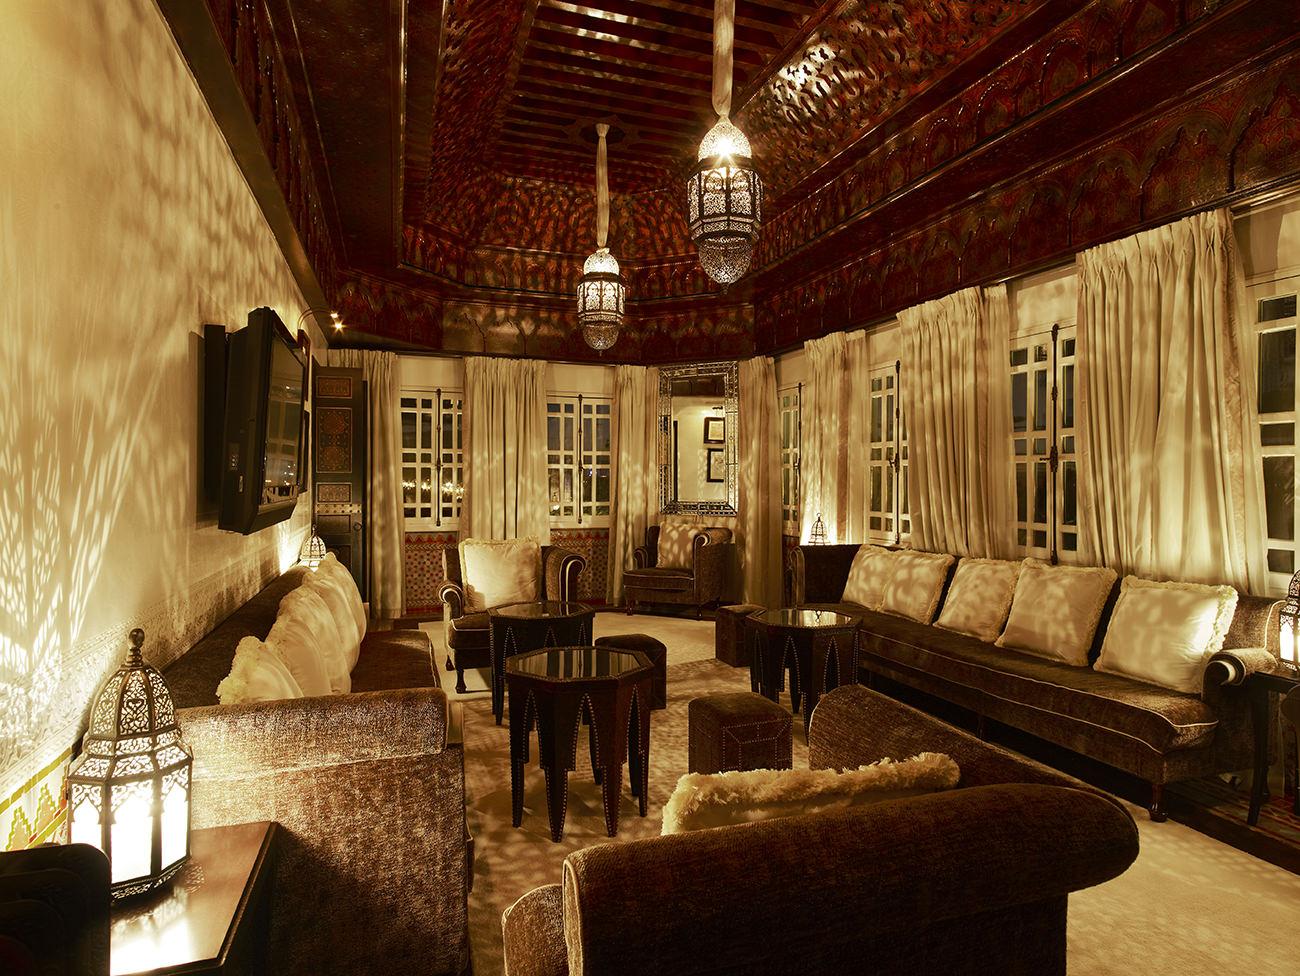 La Mamounia Marrakech A Legendary Moroccan Palace